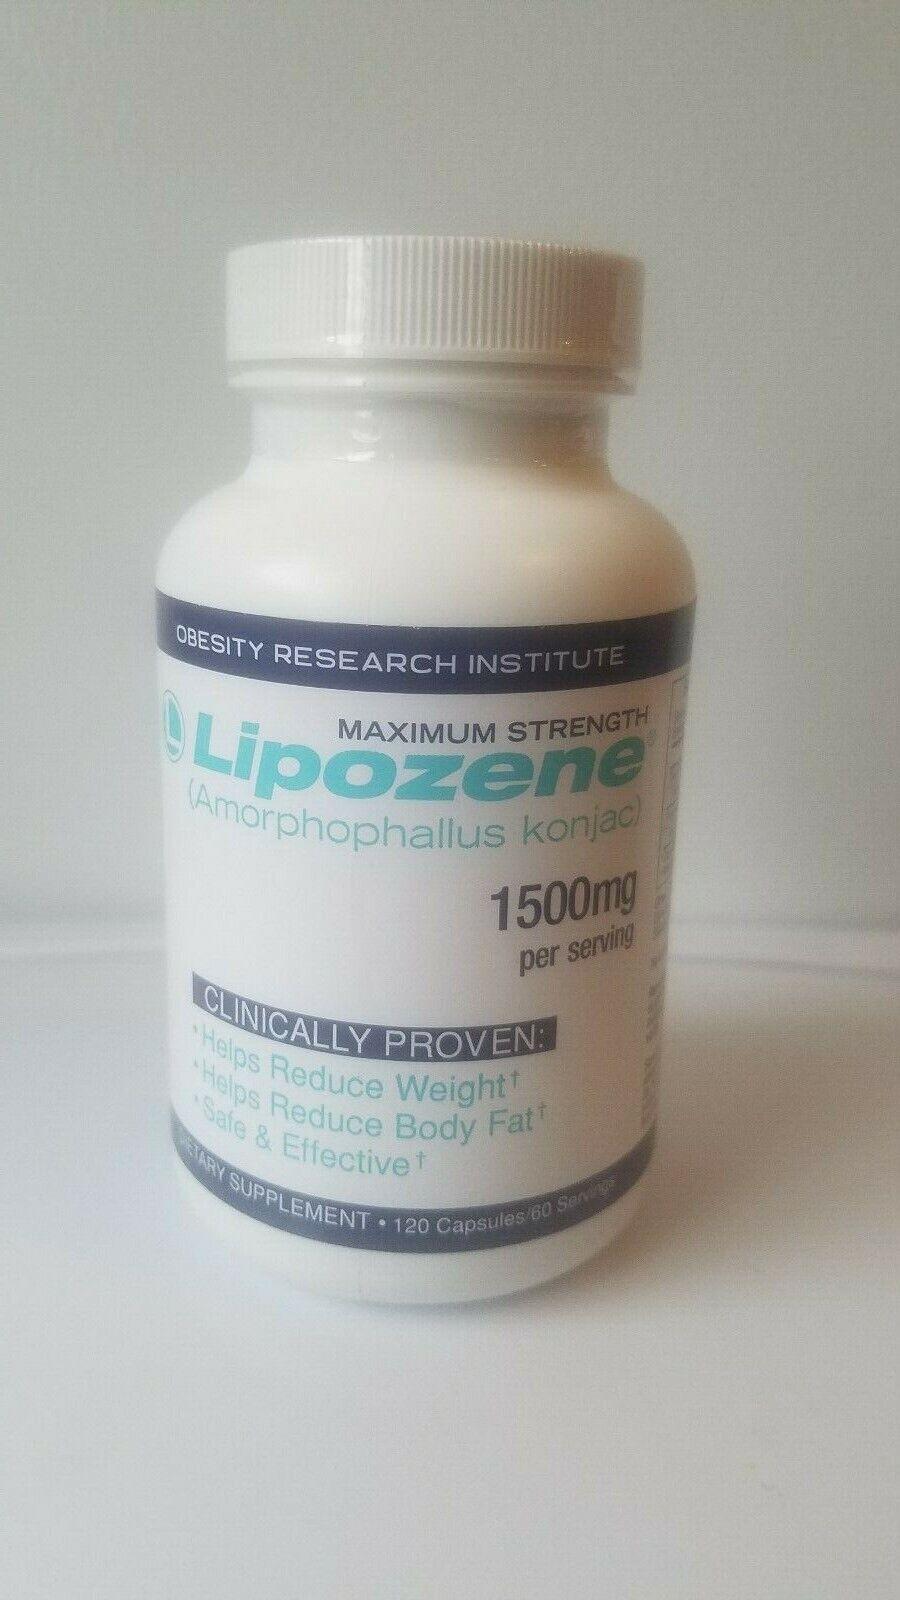 Lipozene maximum strength 1500mg per serving 120 capsules. FREE SHIPPING